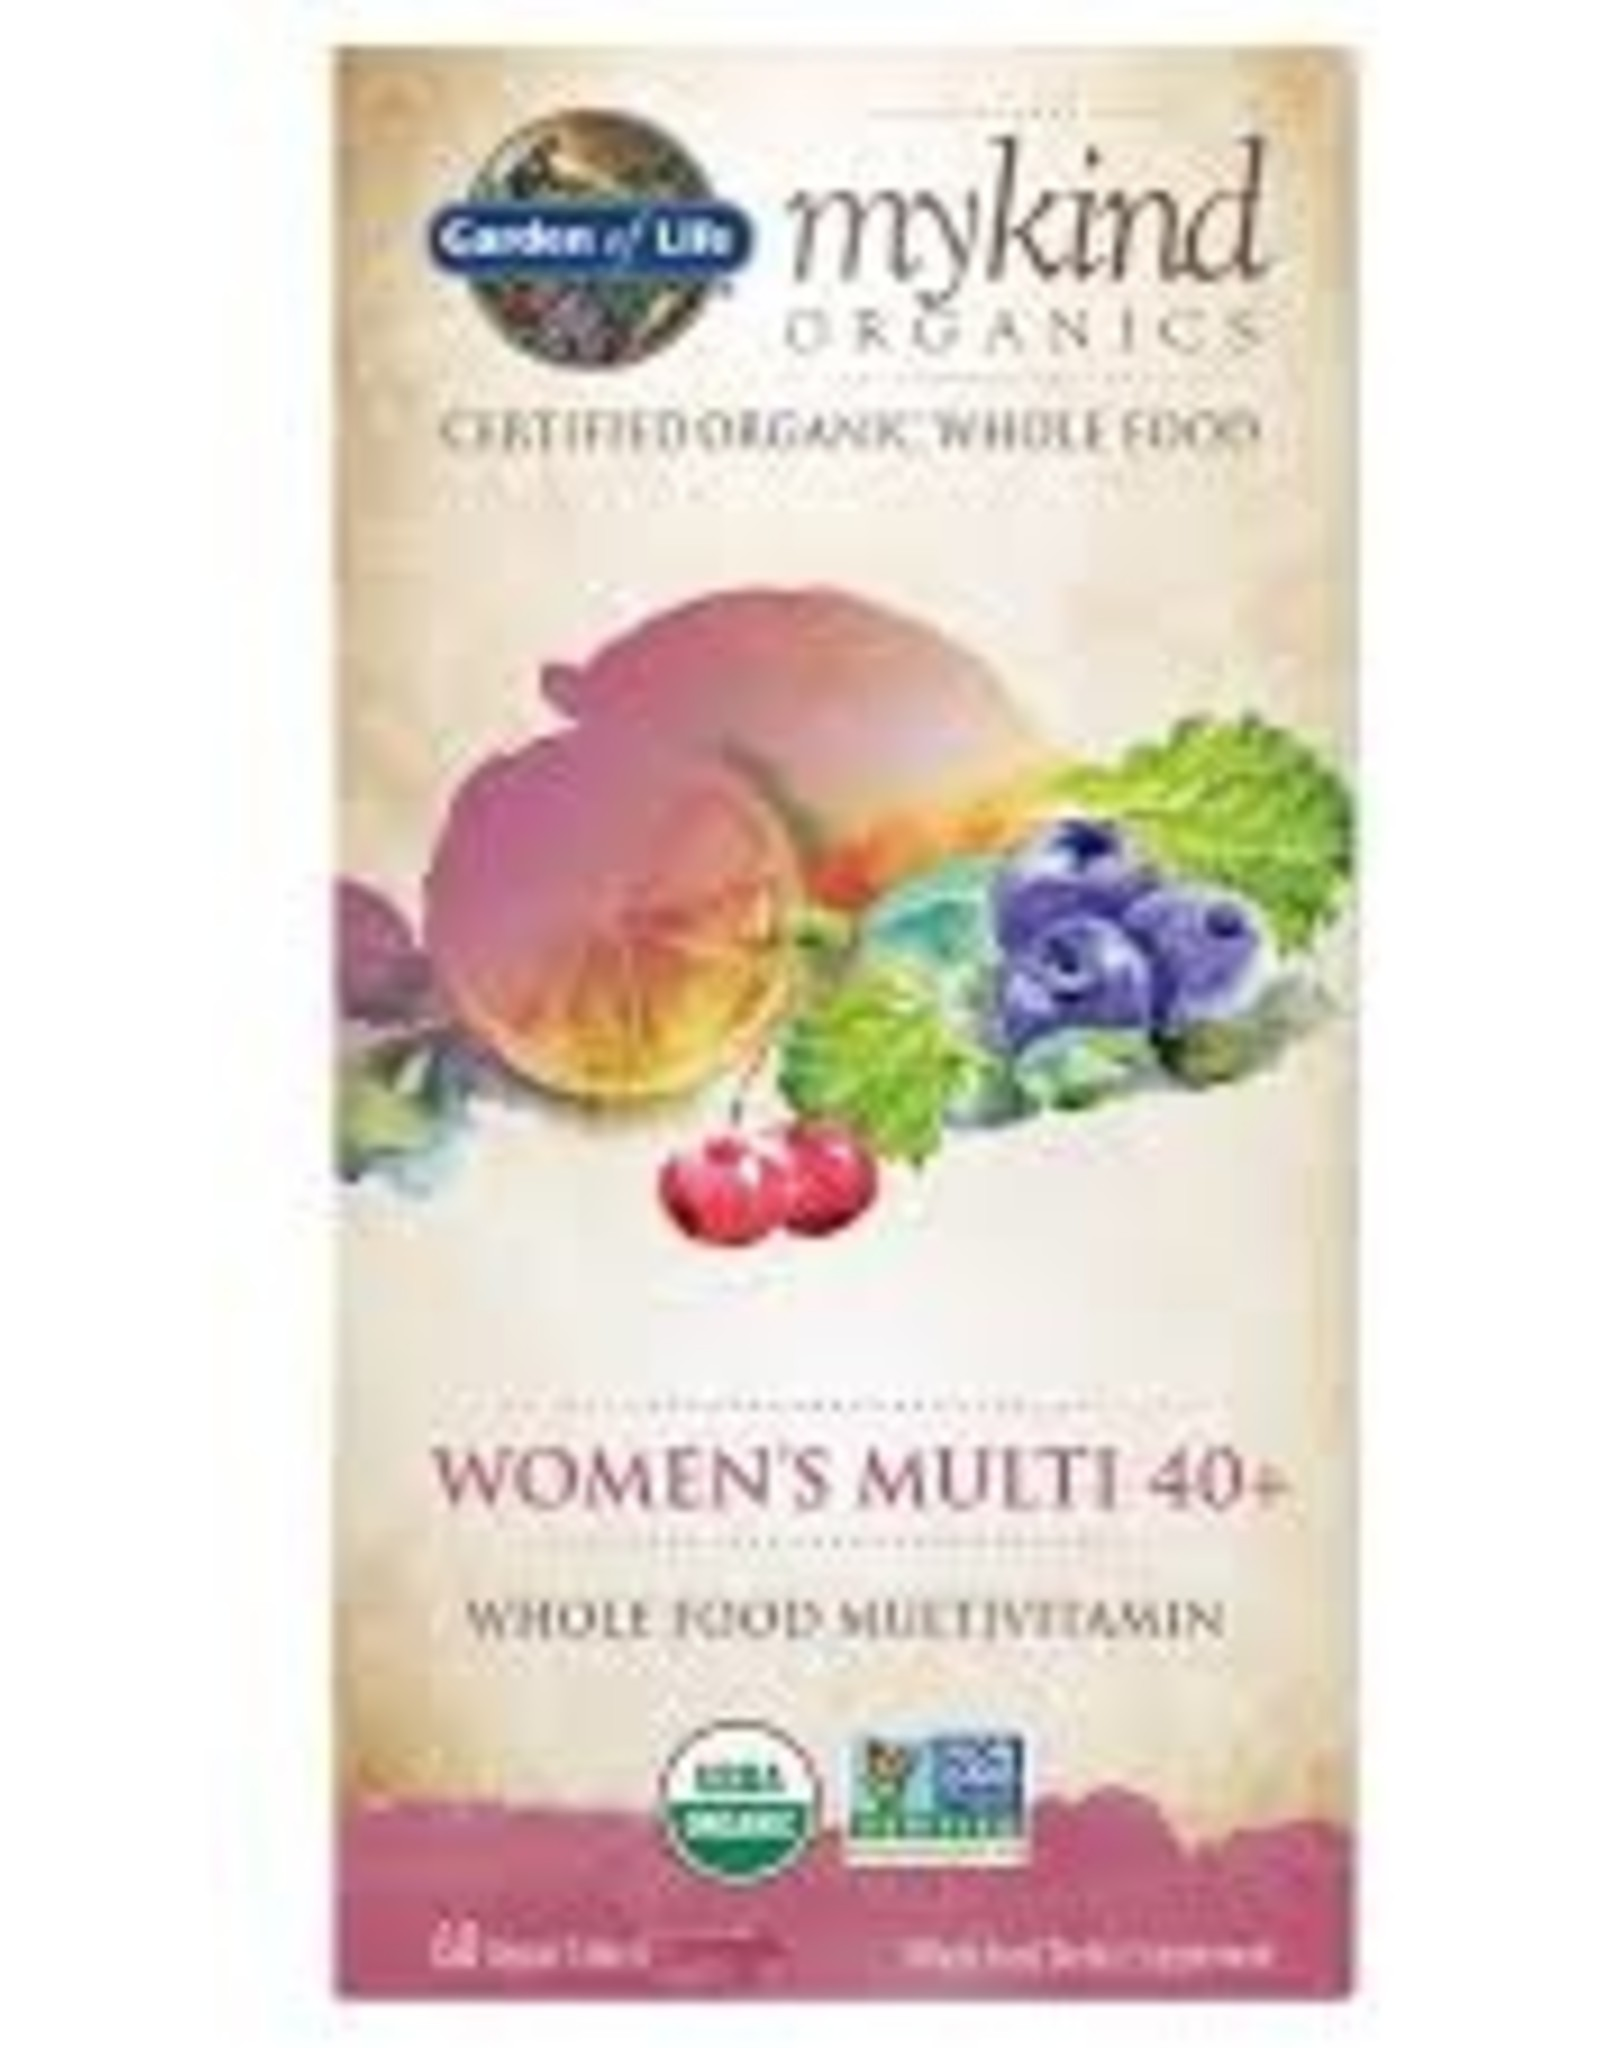 Garden of Life Garden of Life - Mykind Organics, Womens Multi 40+